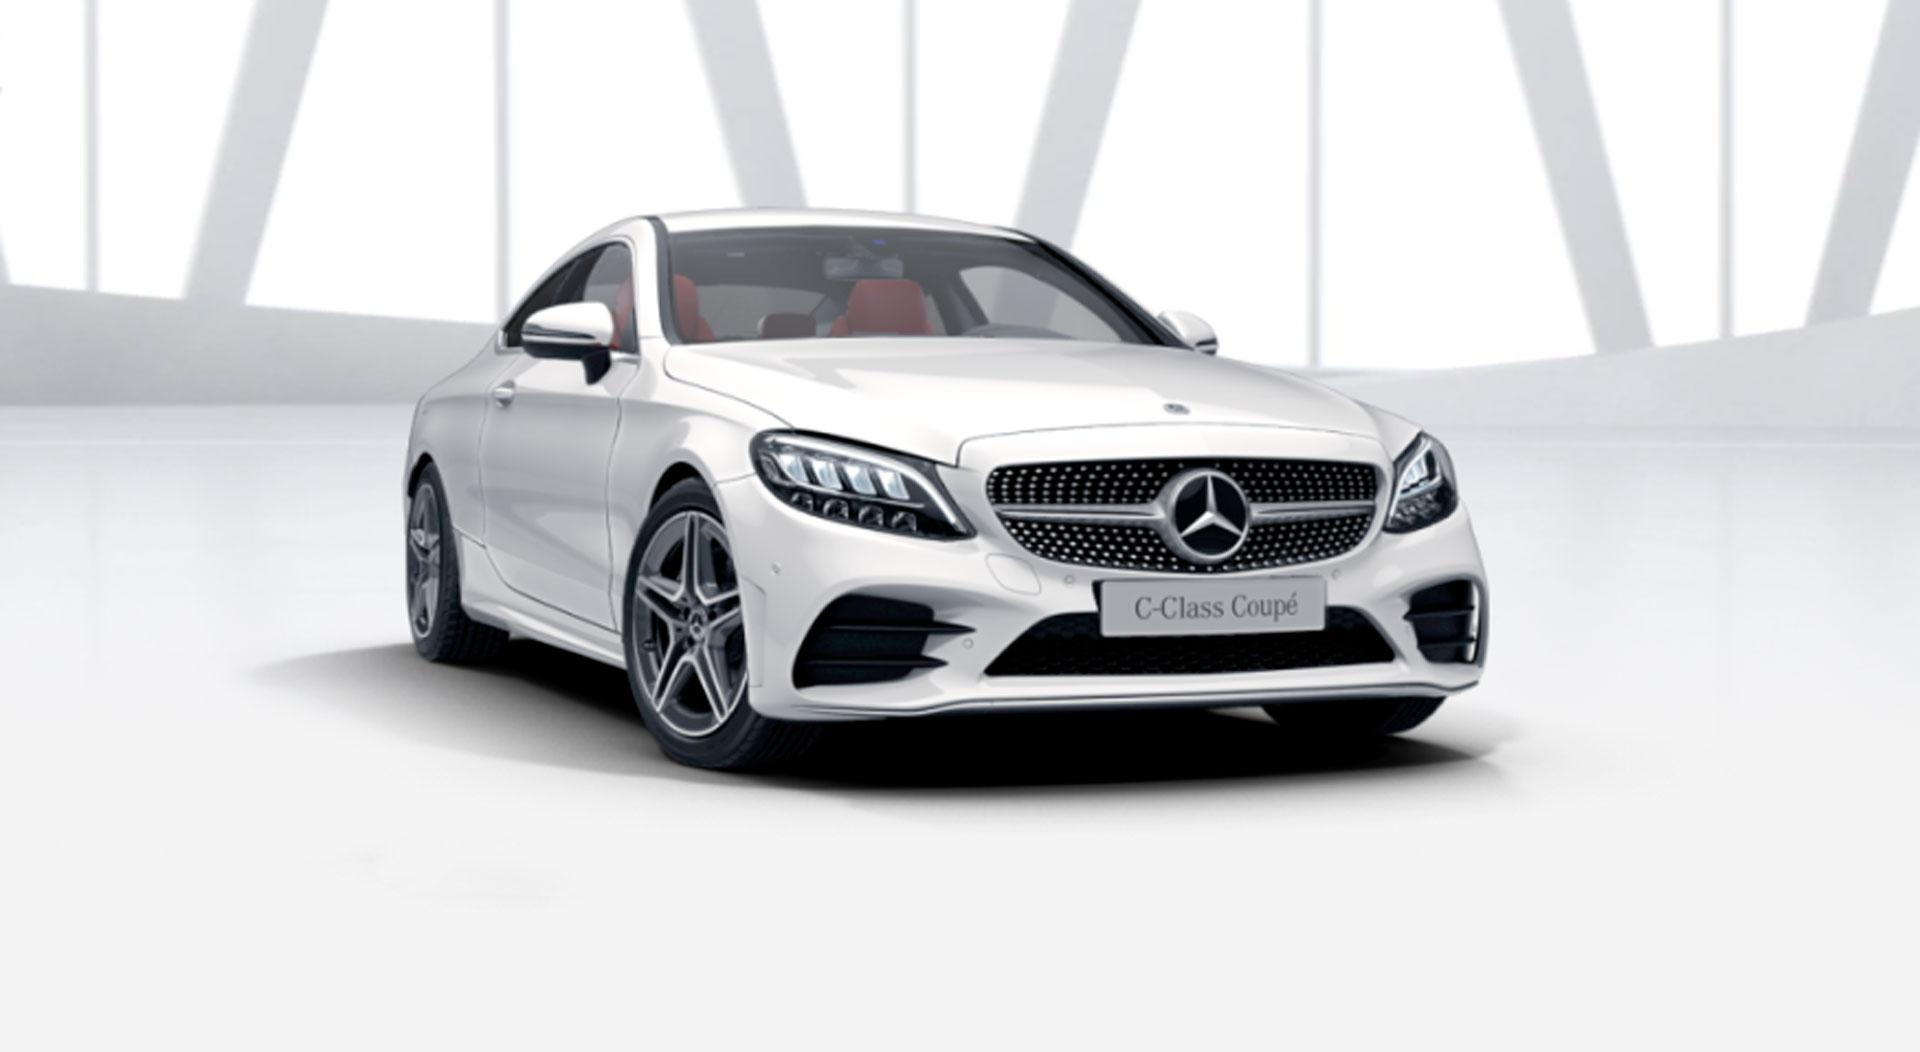 Mercedes-Benz C-Class Coupe 0152606121